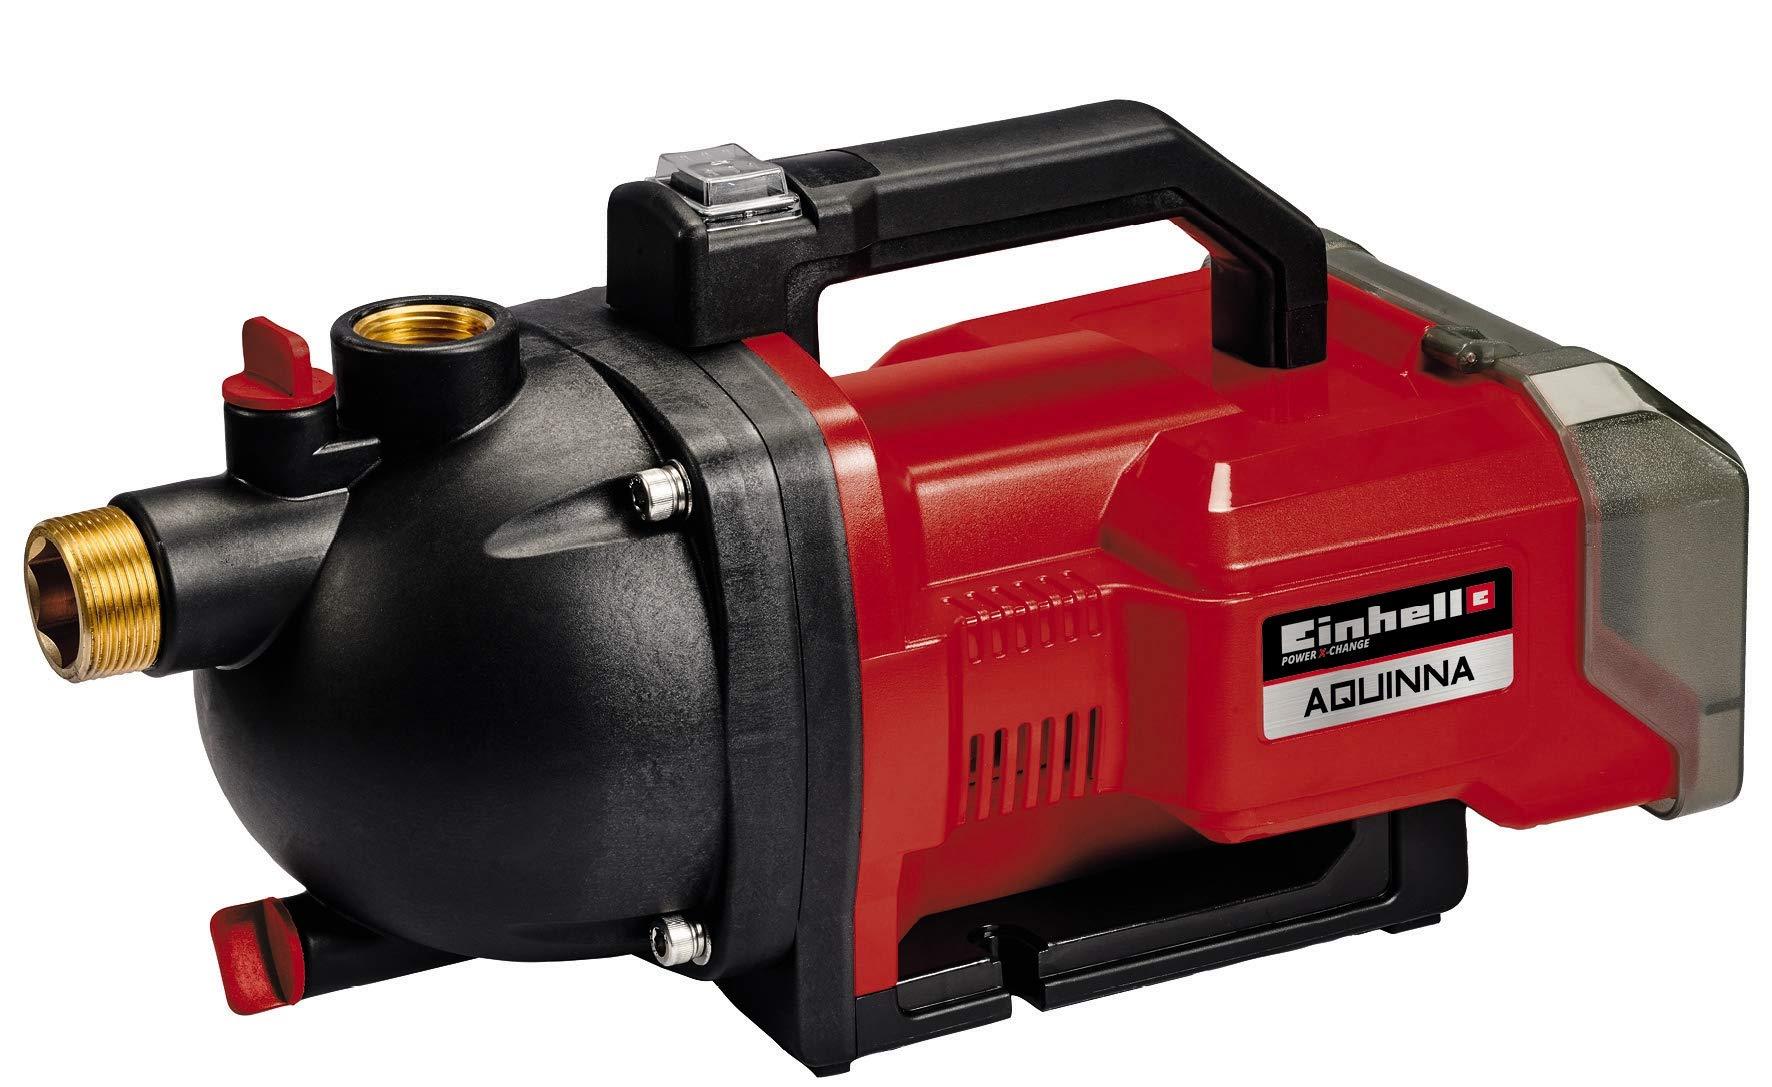 Einhell AQUINNA 36/30 Power X-Change, Bomba de jardín a batería (2 x 18 V, interruptor ECO de 2 escalones, tornillo de entrada y salida de agua, protección térmica, sin baterías ni cargador):